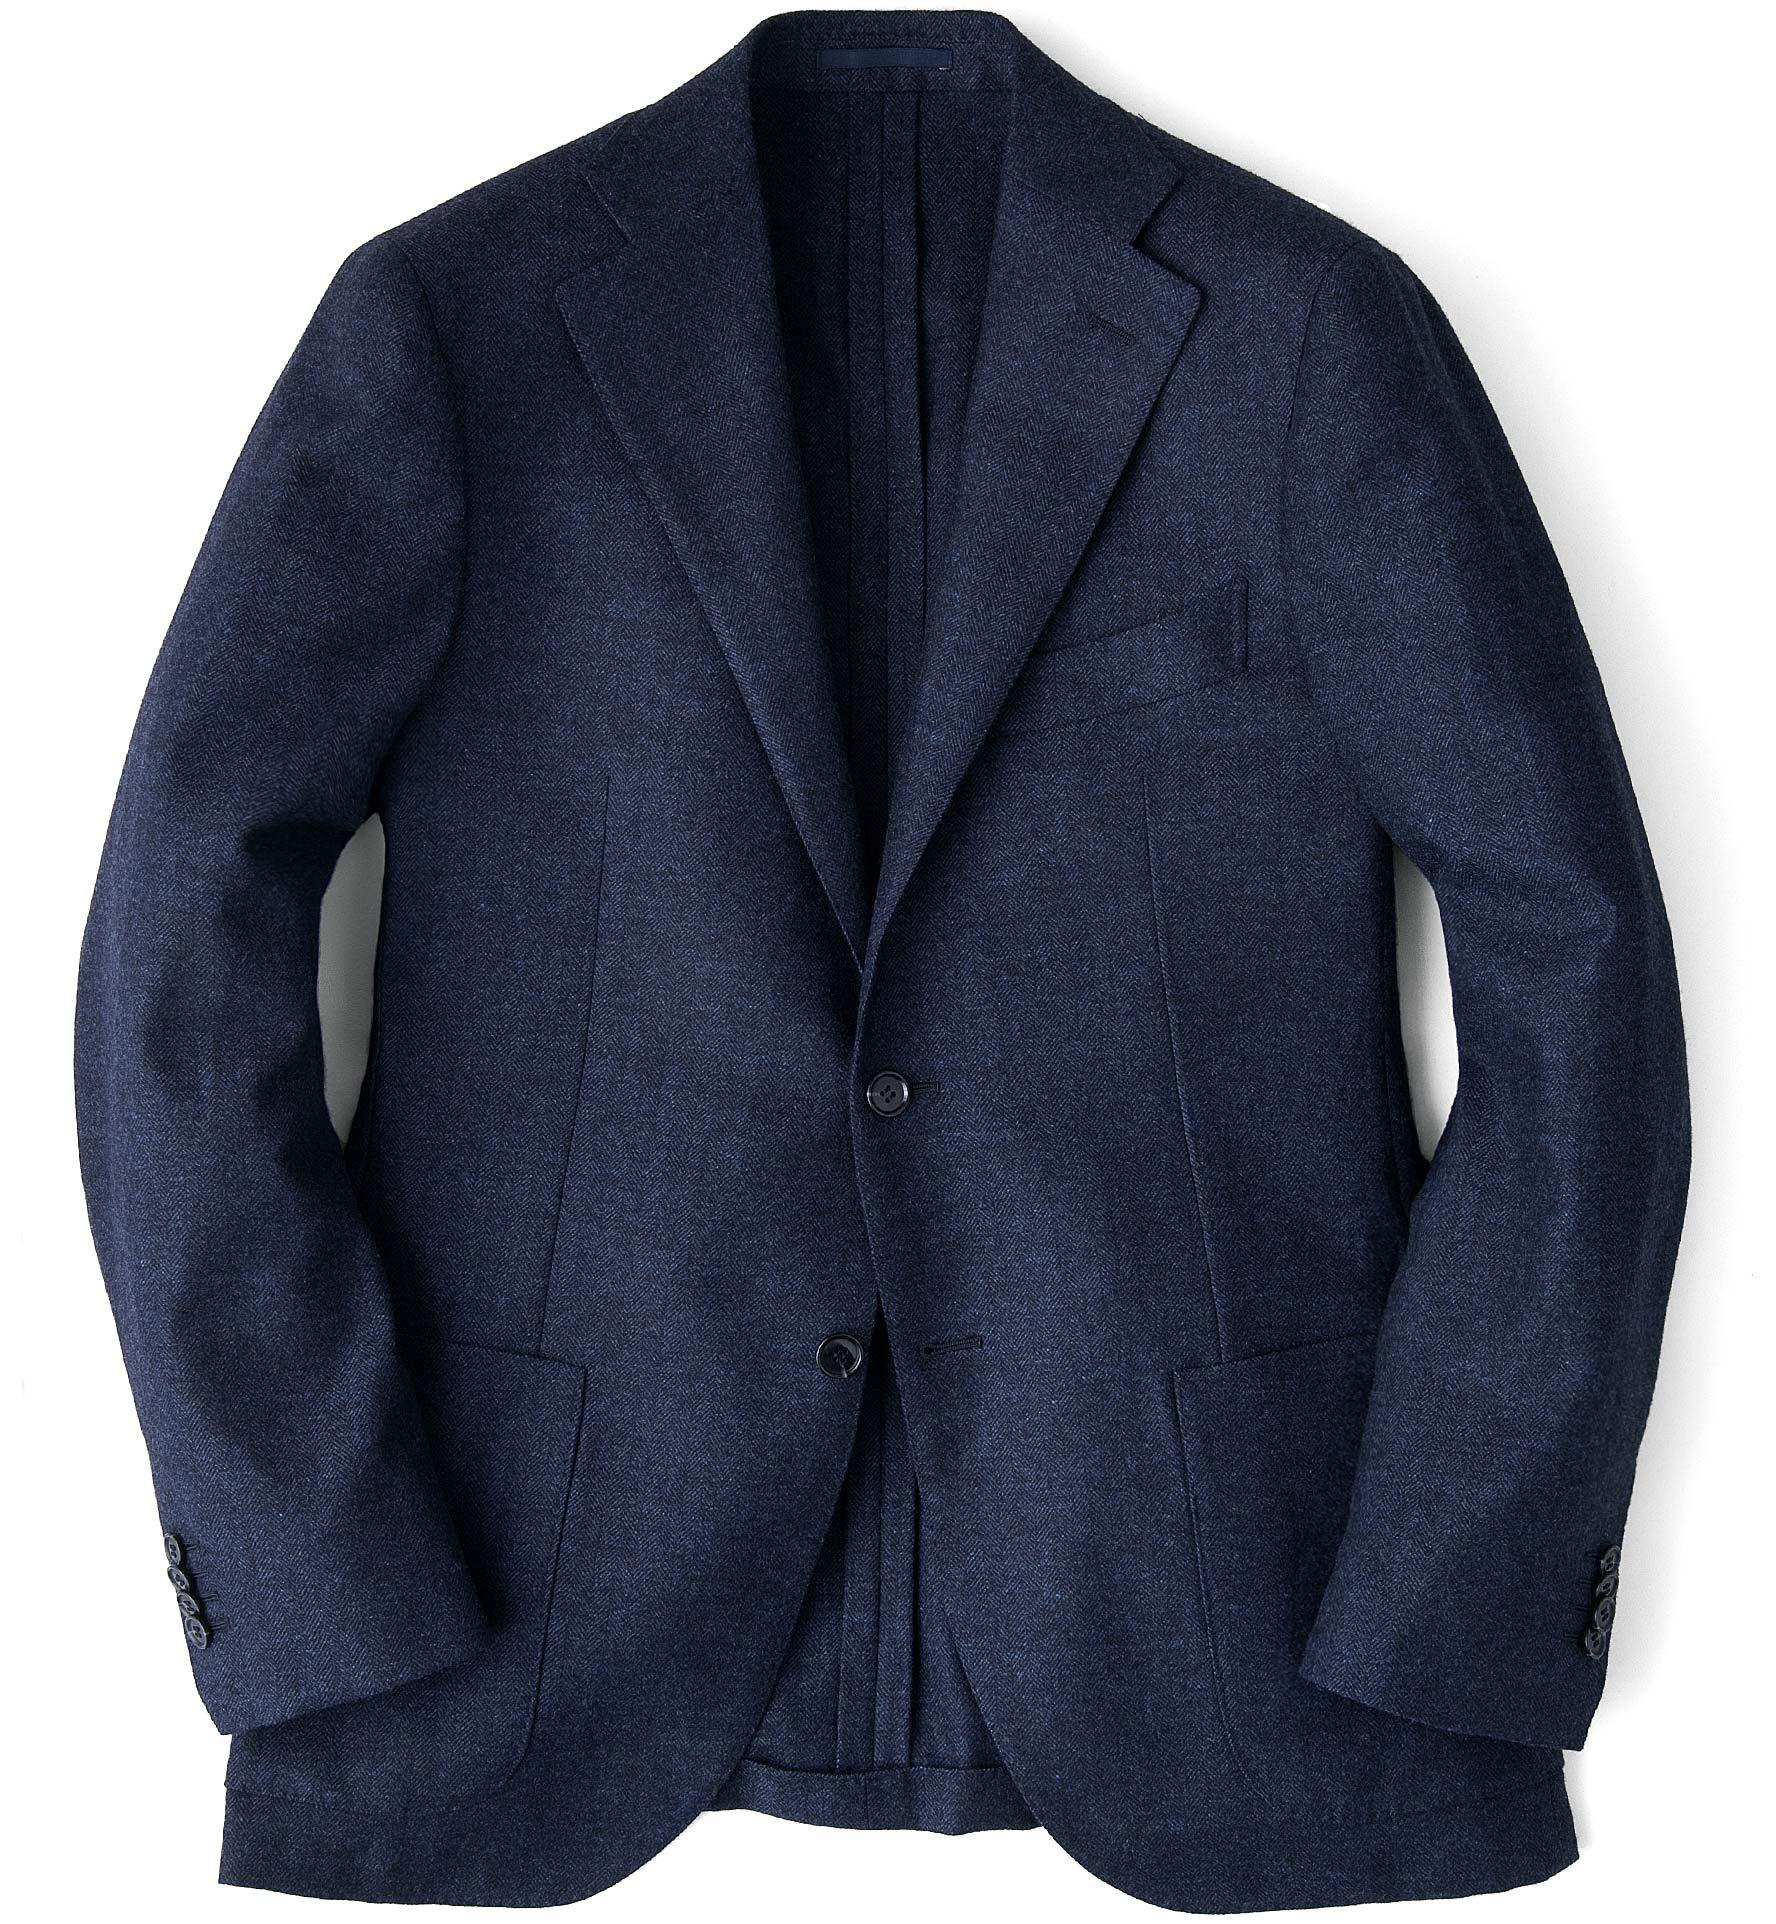 Zoom Image of Navy Wool Cashmere Herringbone Hudson Jacket